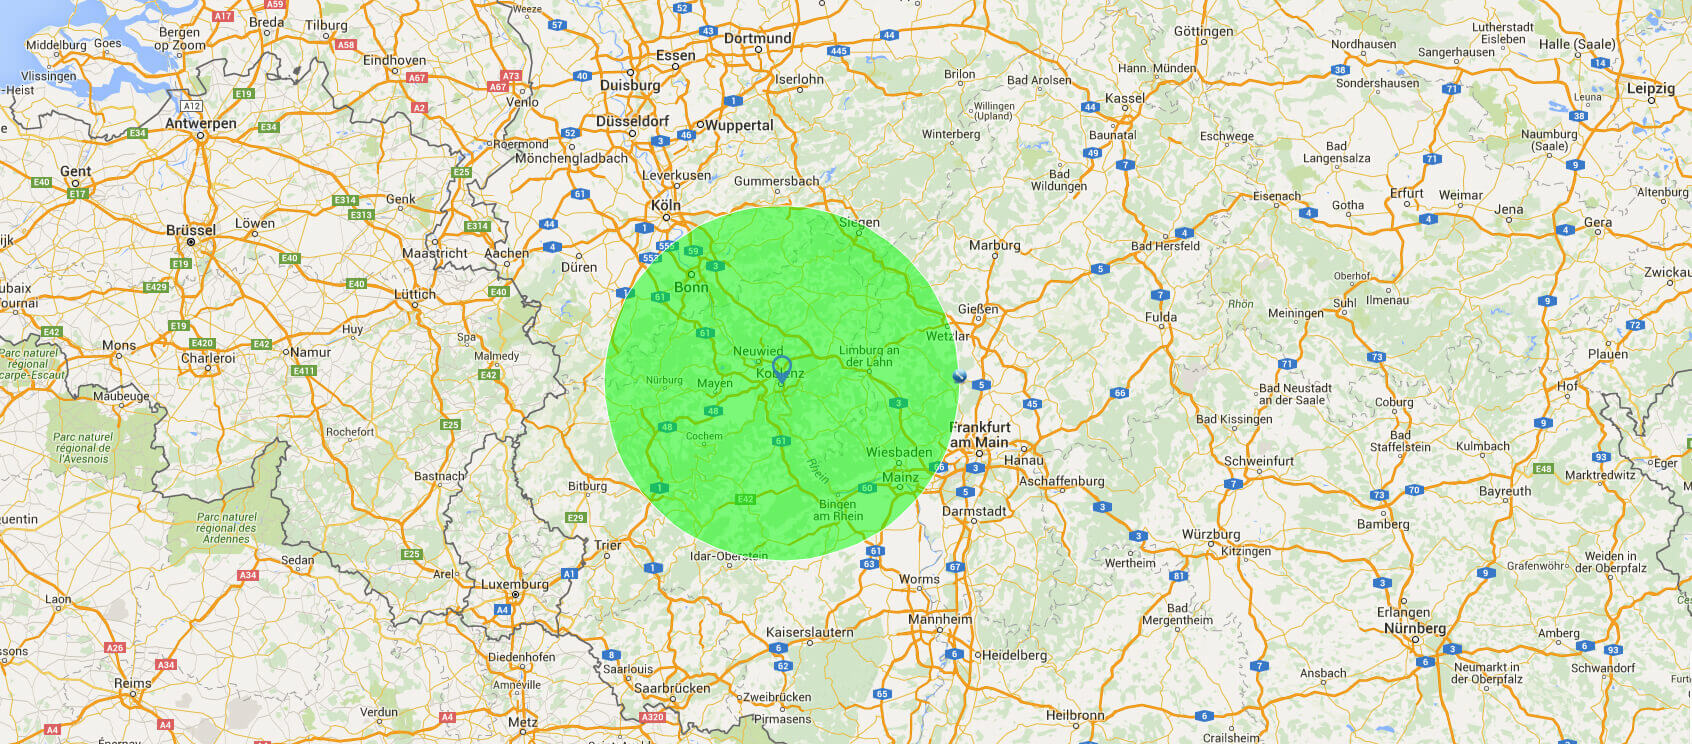 GPS KFZ Überwachung mittels GPS Ortung